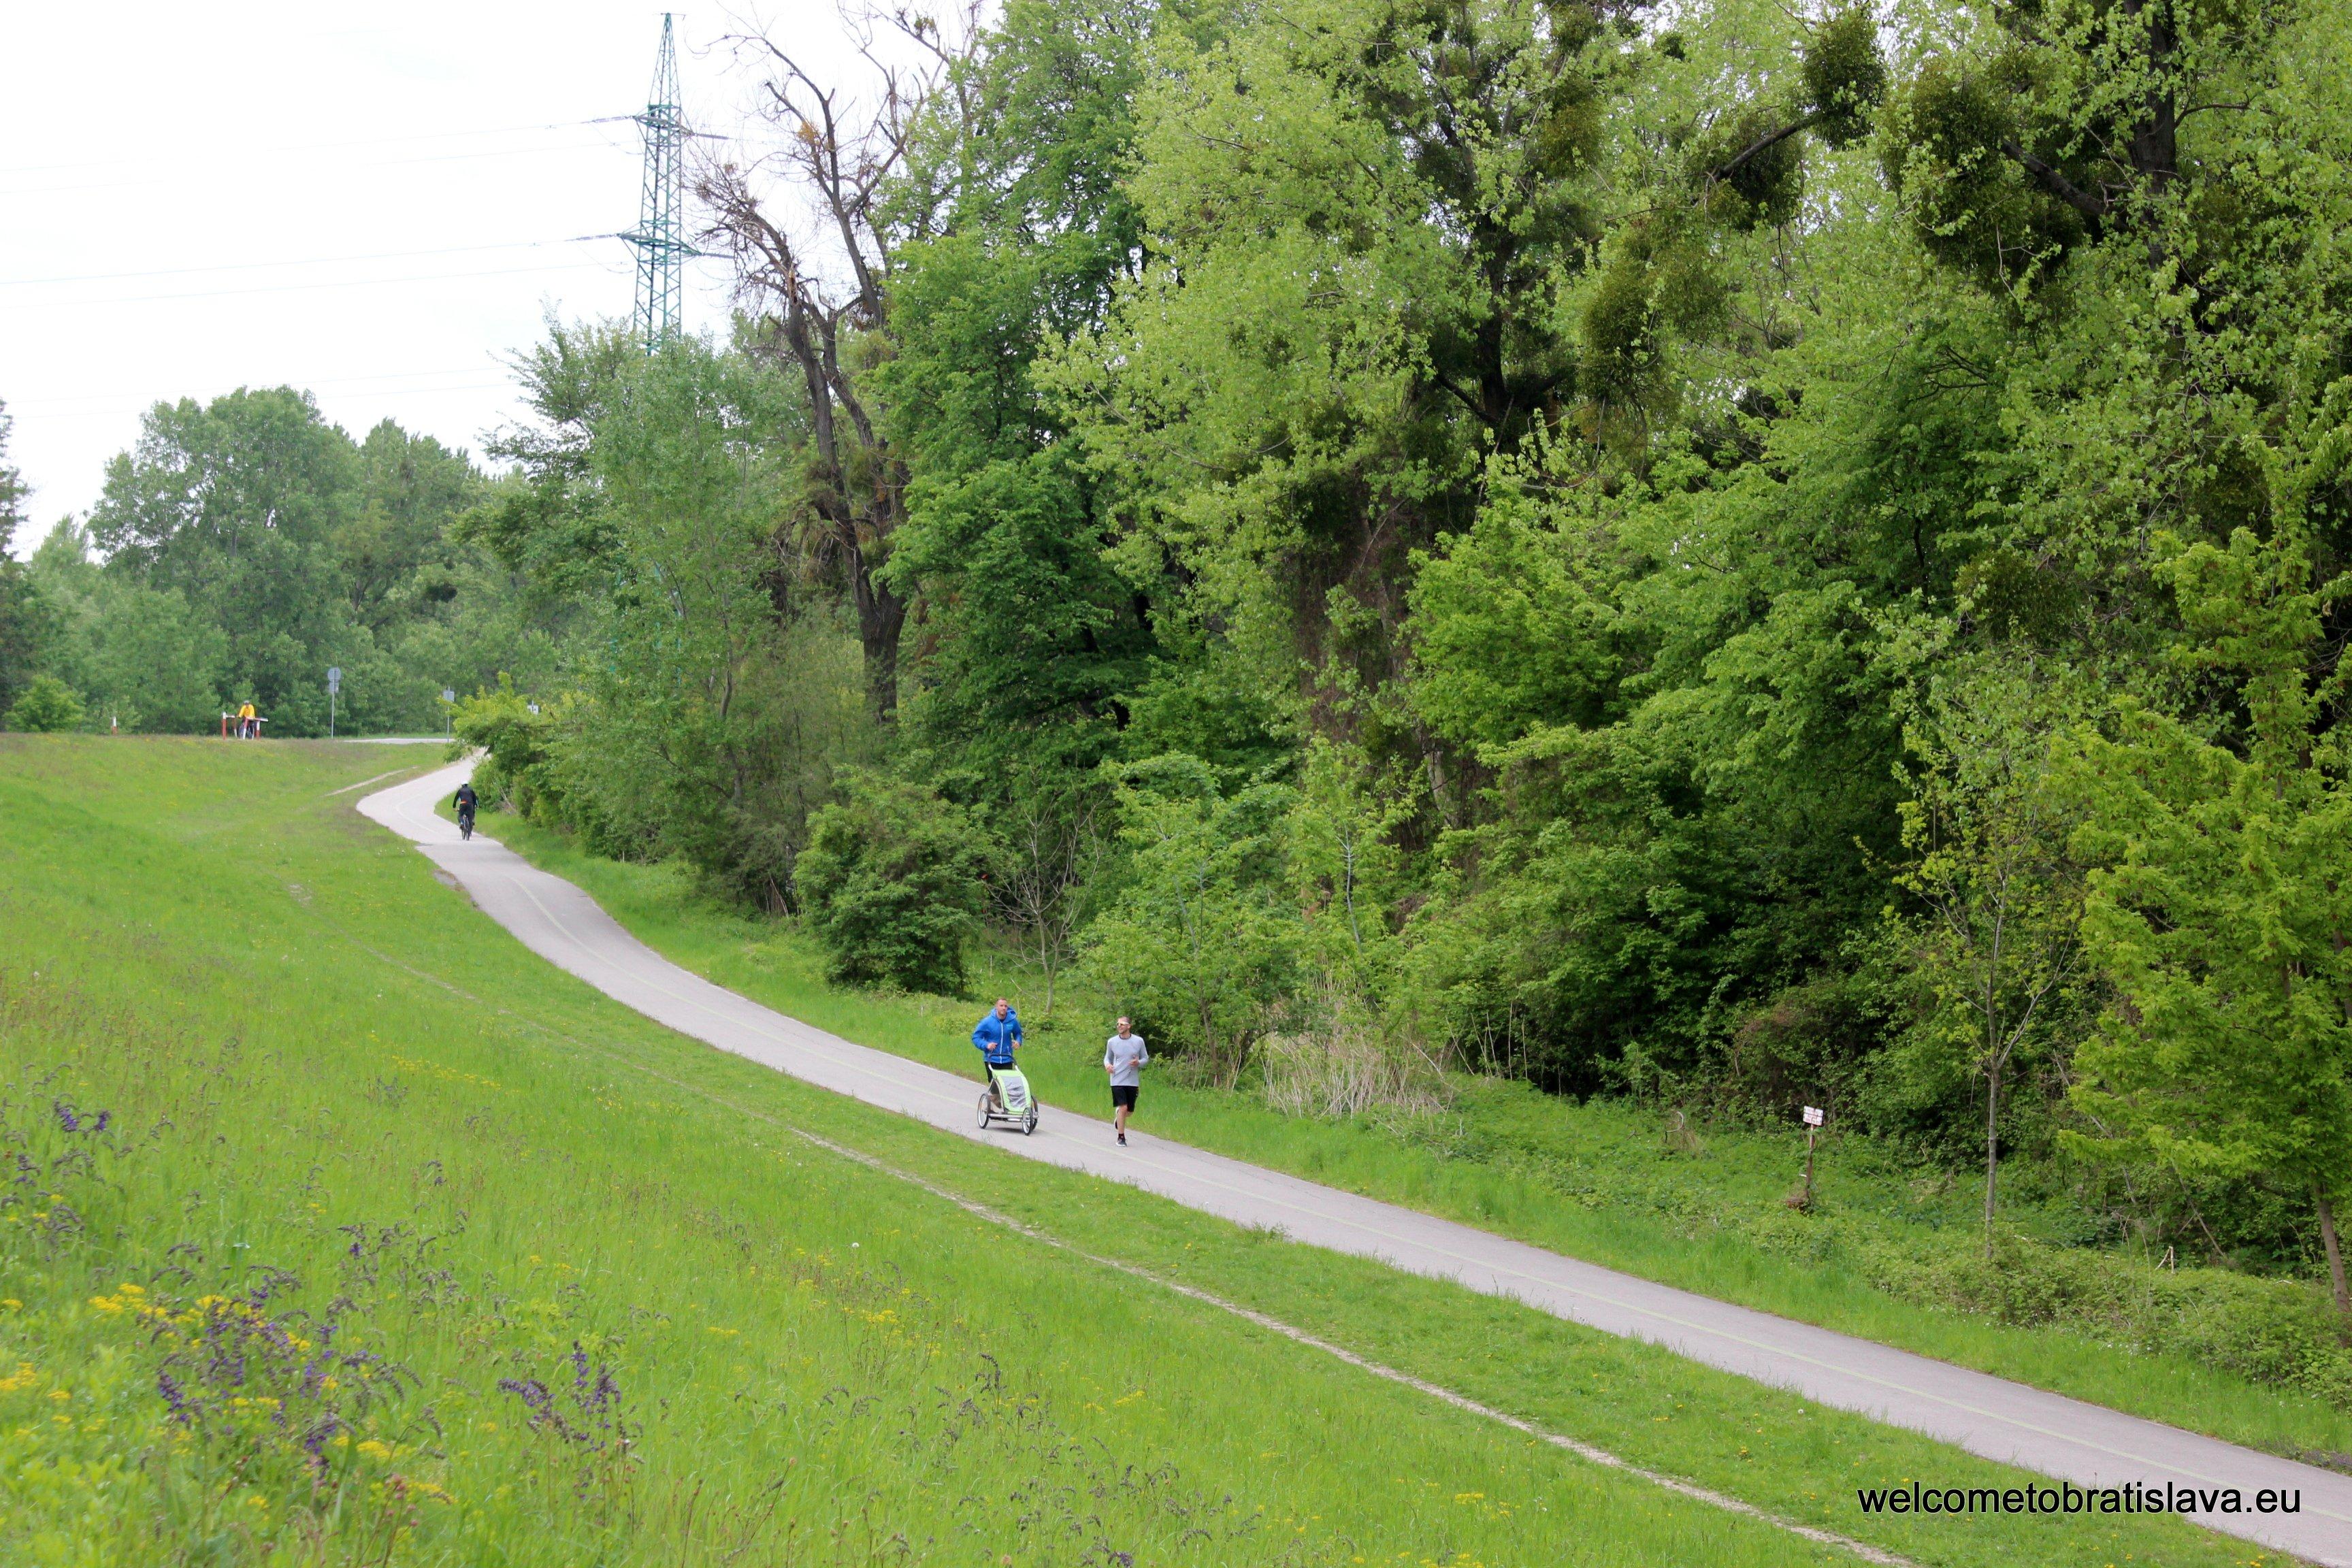 Best running spots in Bratislava - Petrzalka Dam